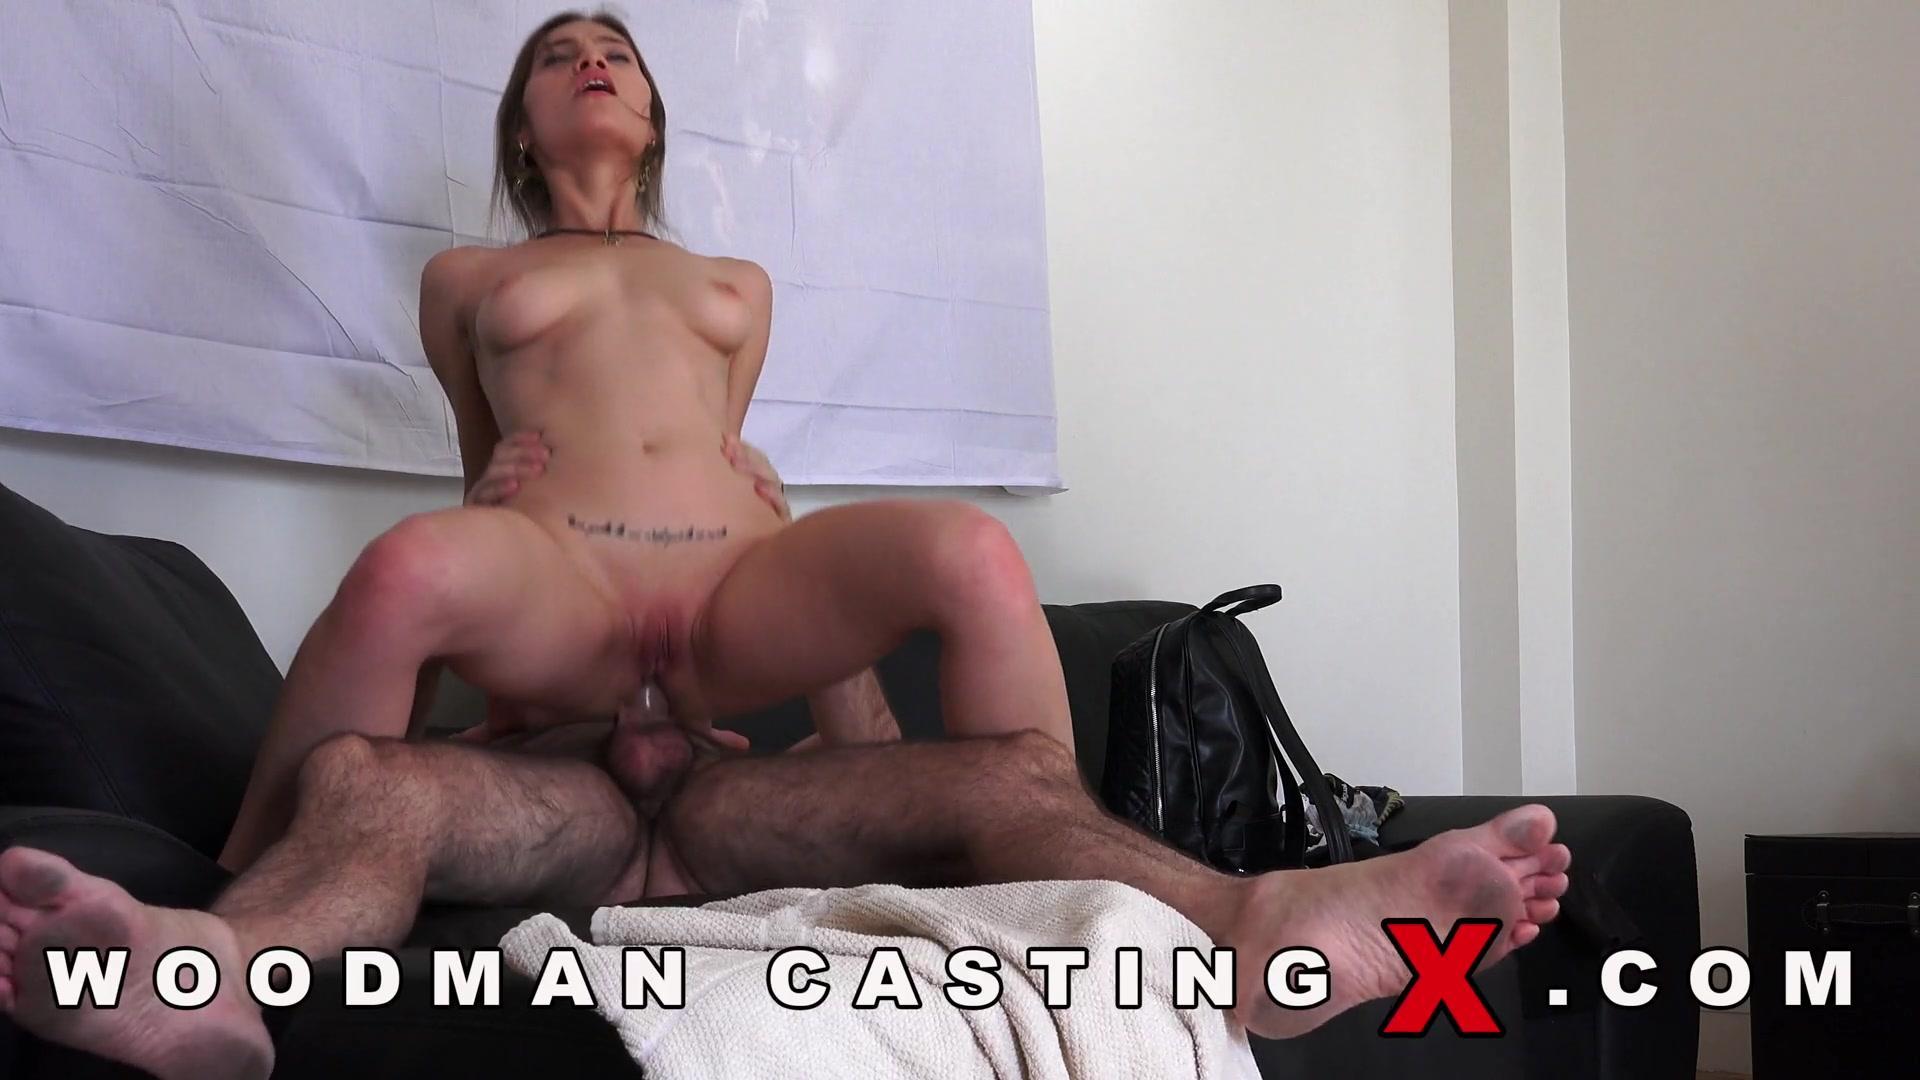 Woodmancastingx New Adult Photo